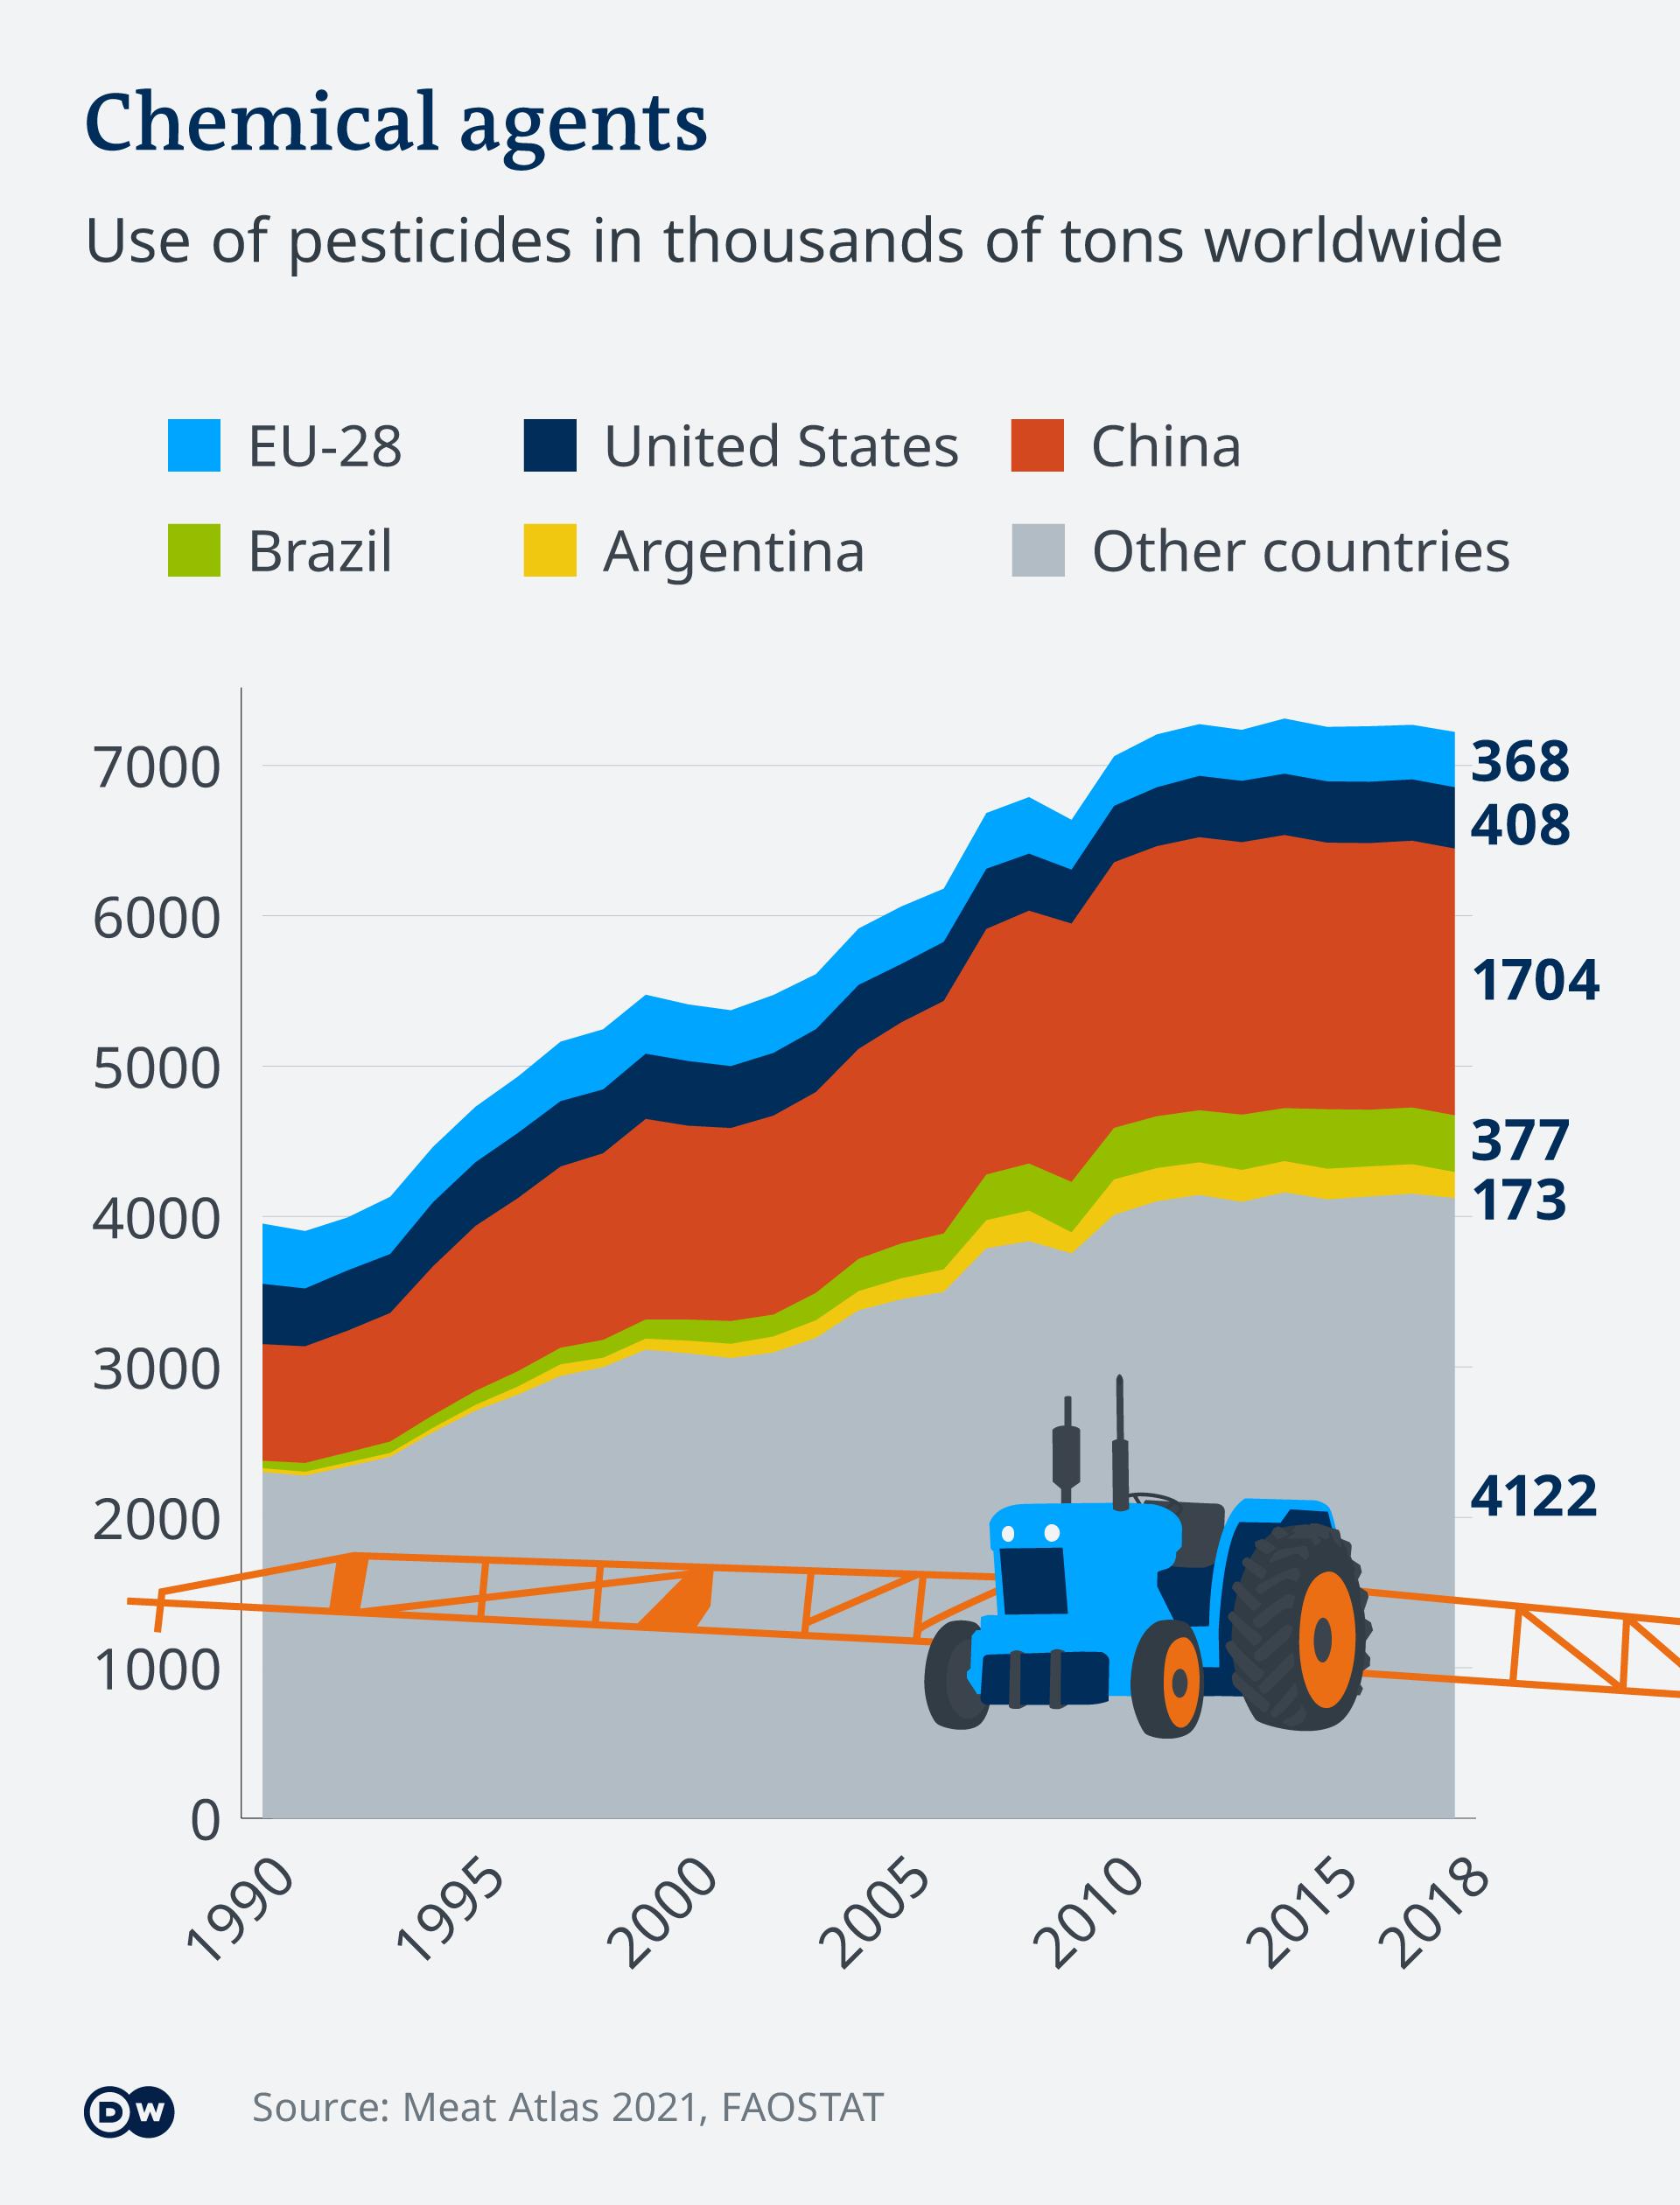 Use of pesticides worldwide